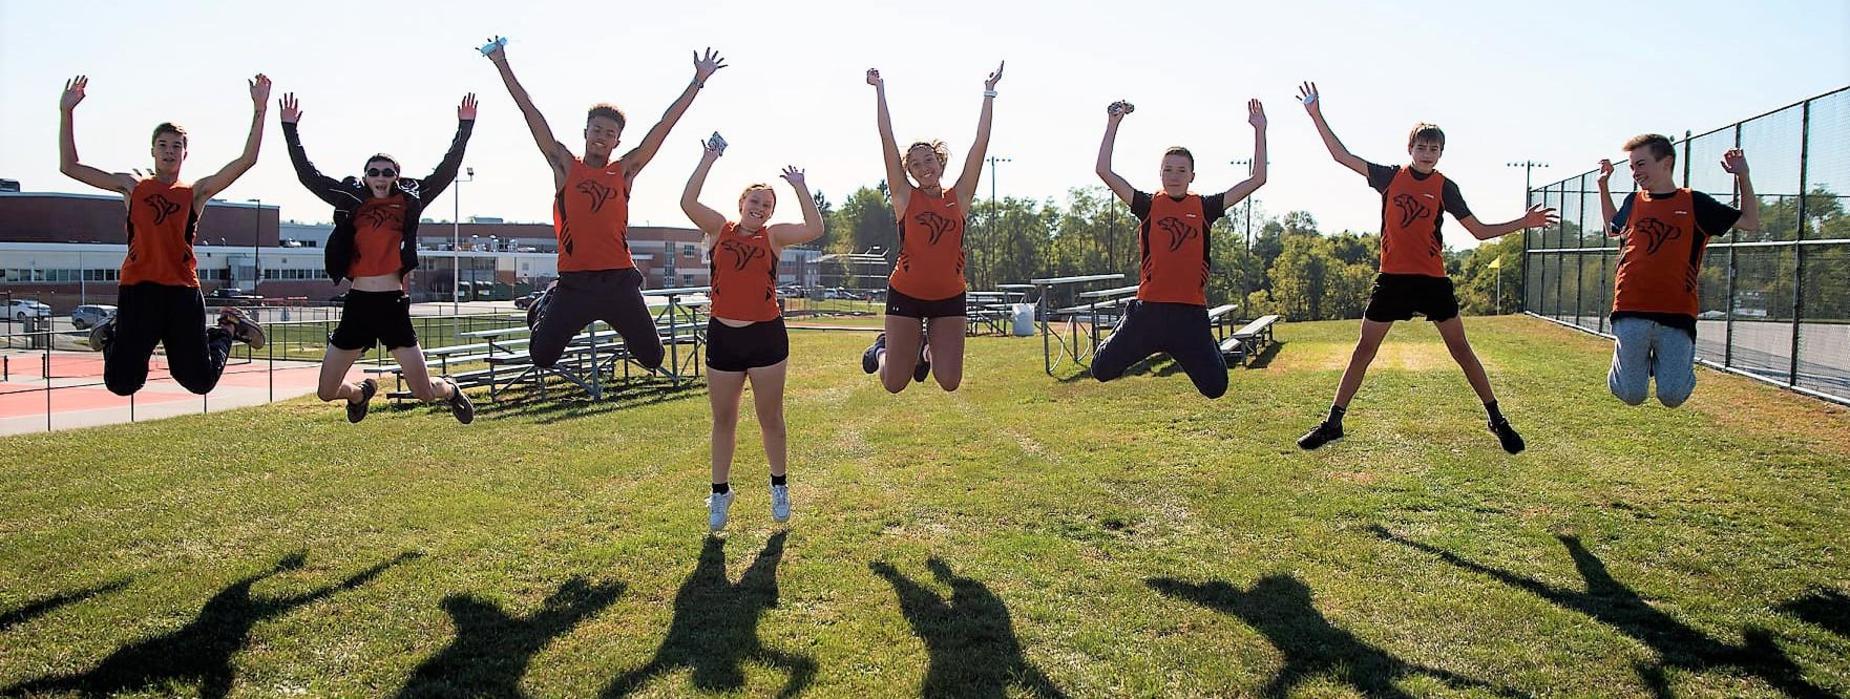 cross country jump